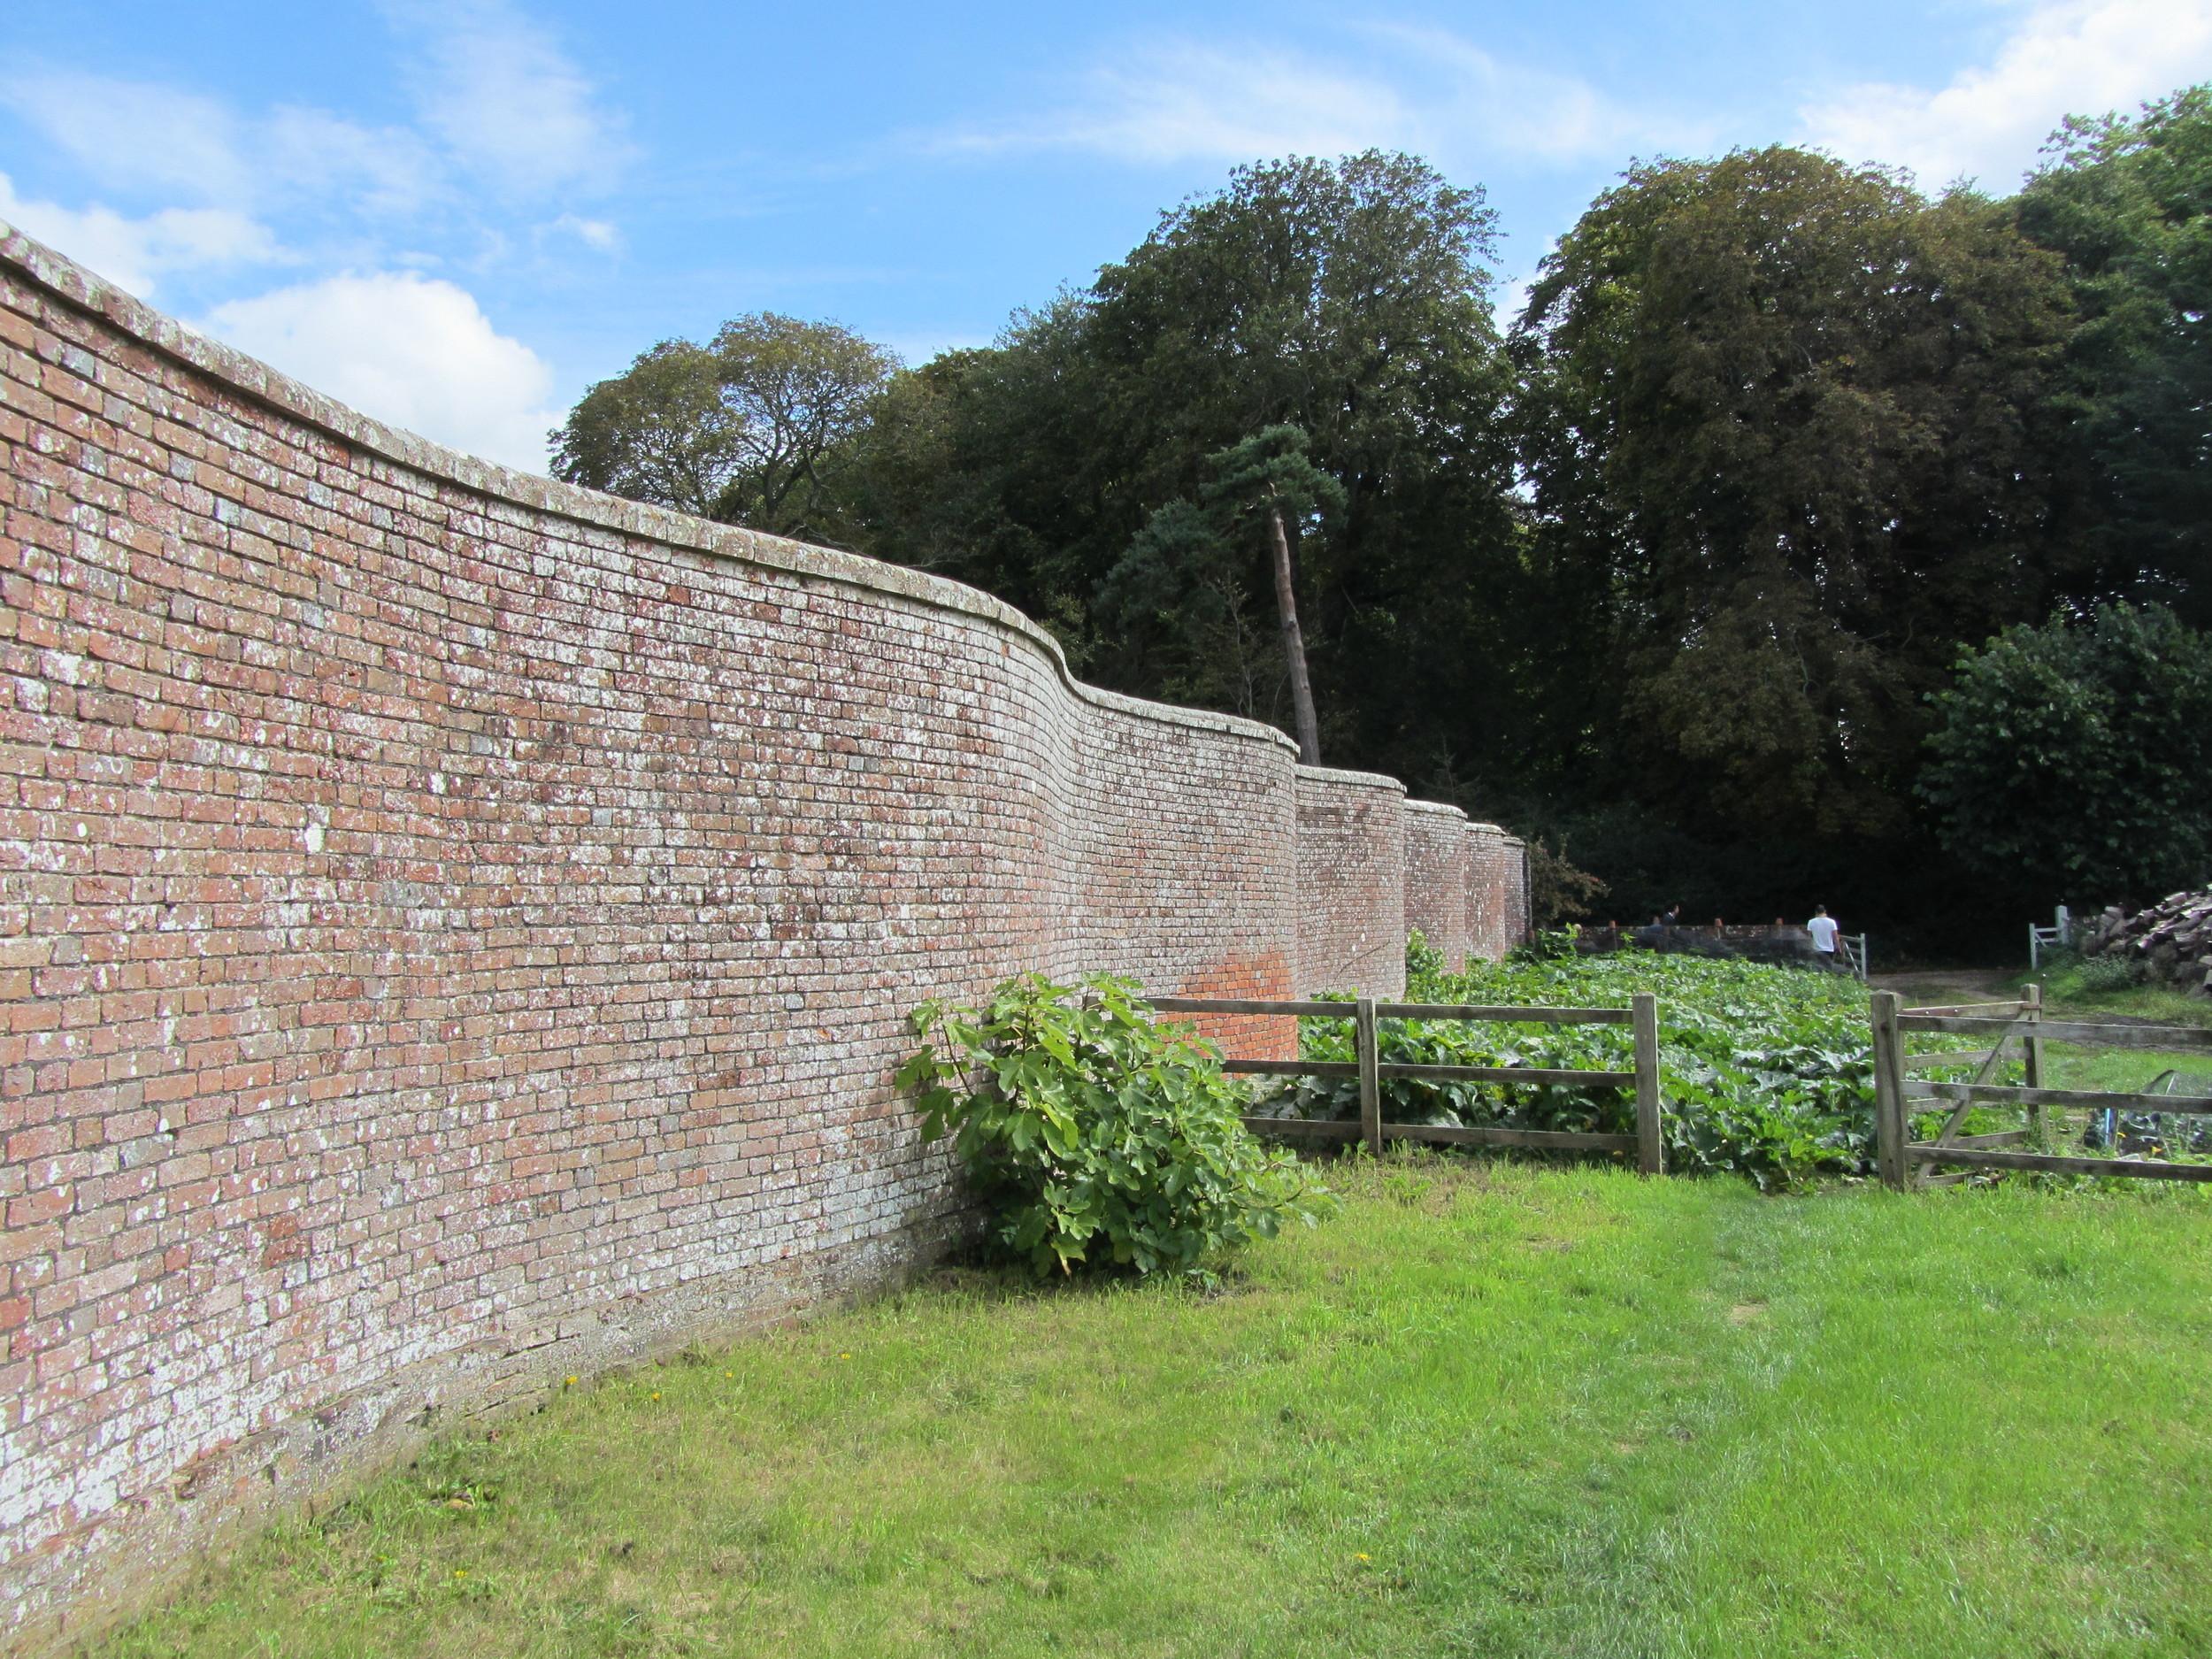 Serpentine Wall, Deans Court, Dorset